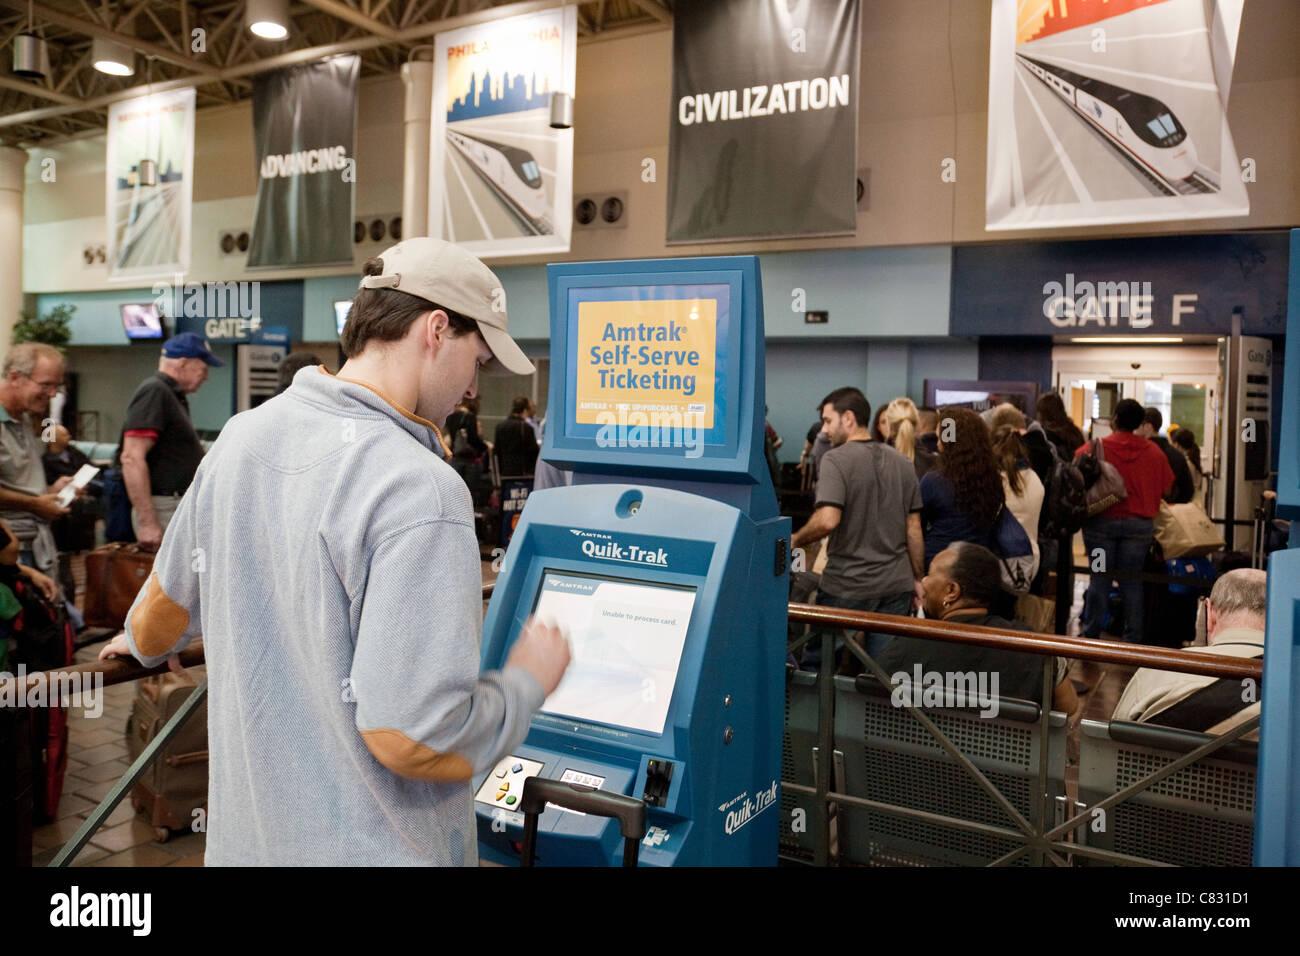 A man buying a rail ticket for an Amtrak train, Union Station, Washington DC USA - Stock Image